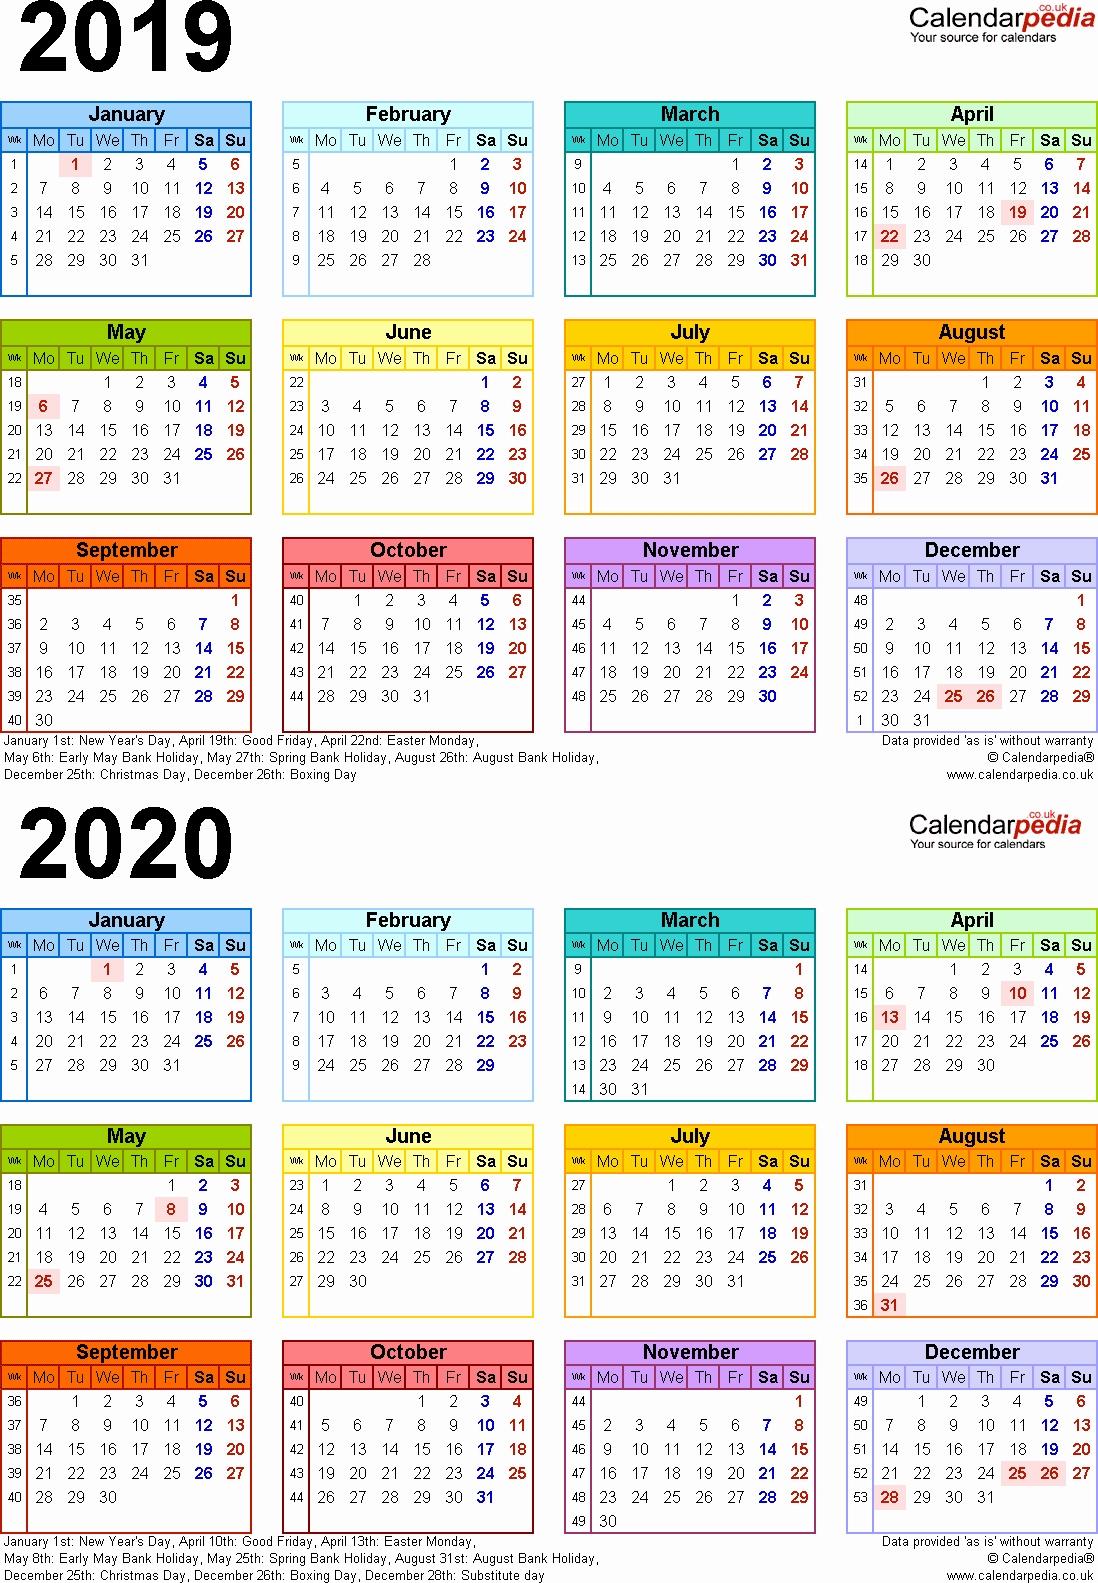 Hindu Calendar In English 2019 2020 Two Year Calendars For